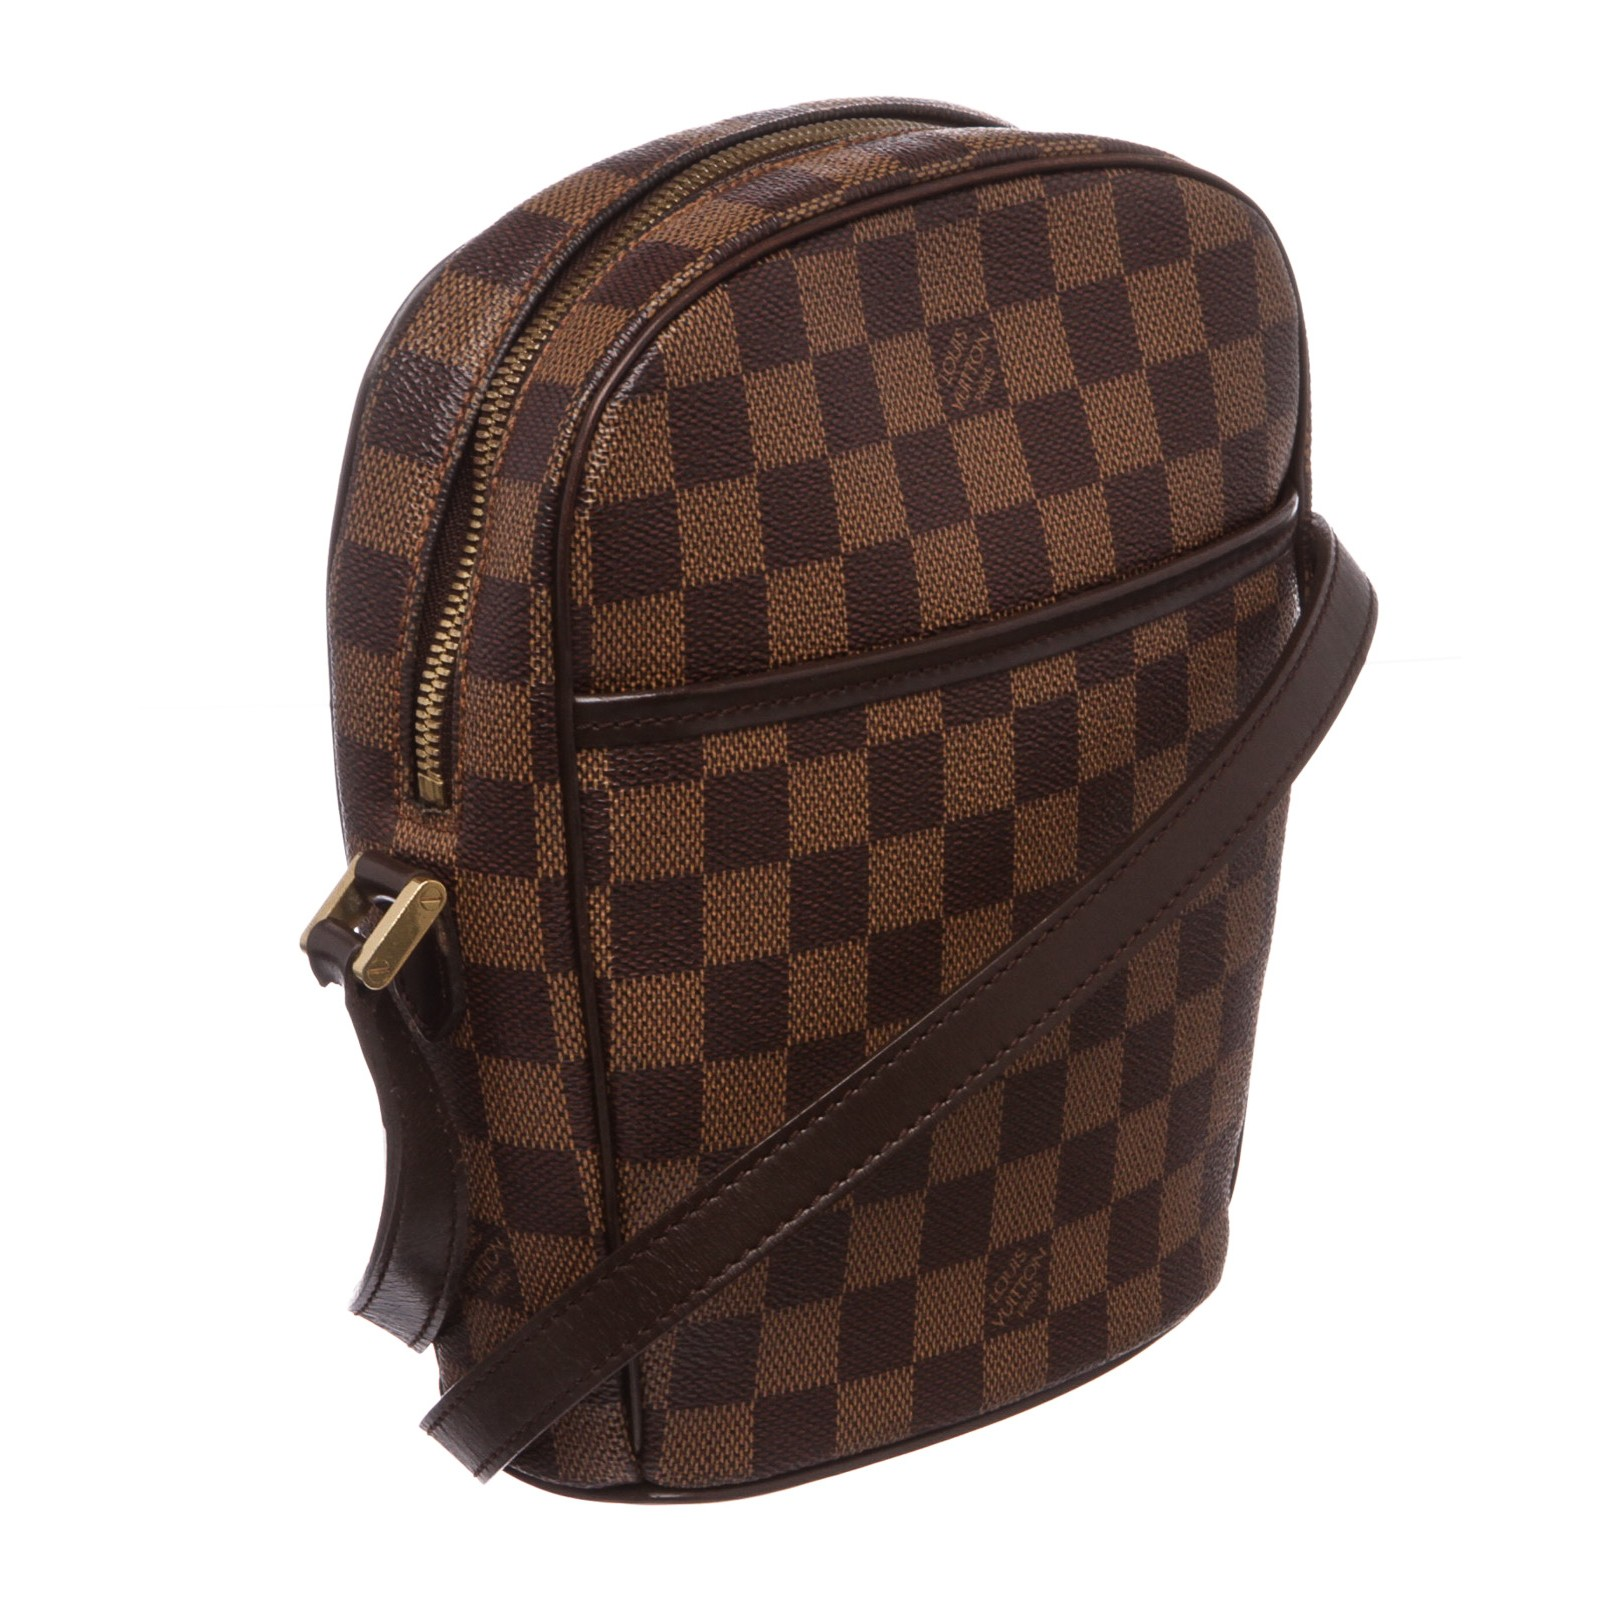 3019c8f5f2e2 Shop for Louis Vuitton Damier Ebene Canvas Leather Ipanema PM Bag ...